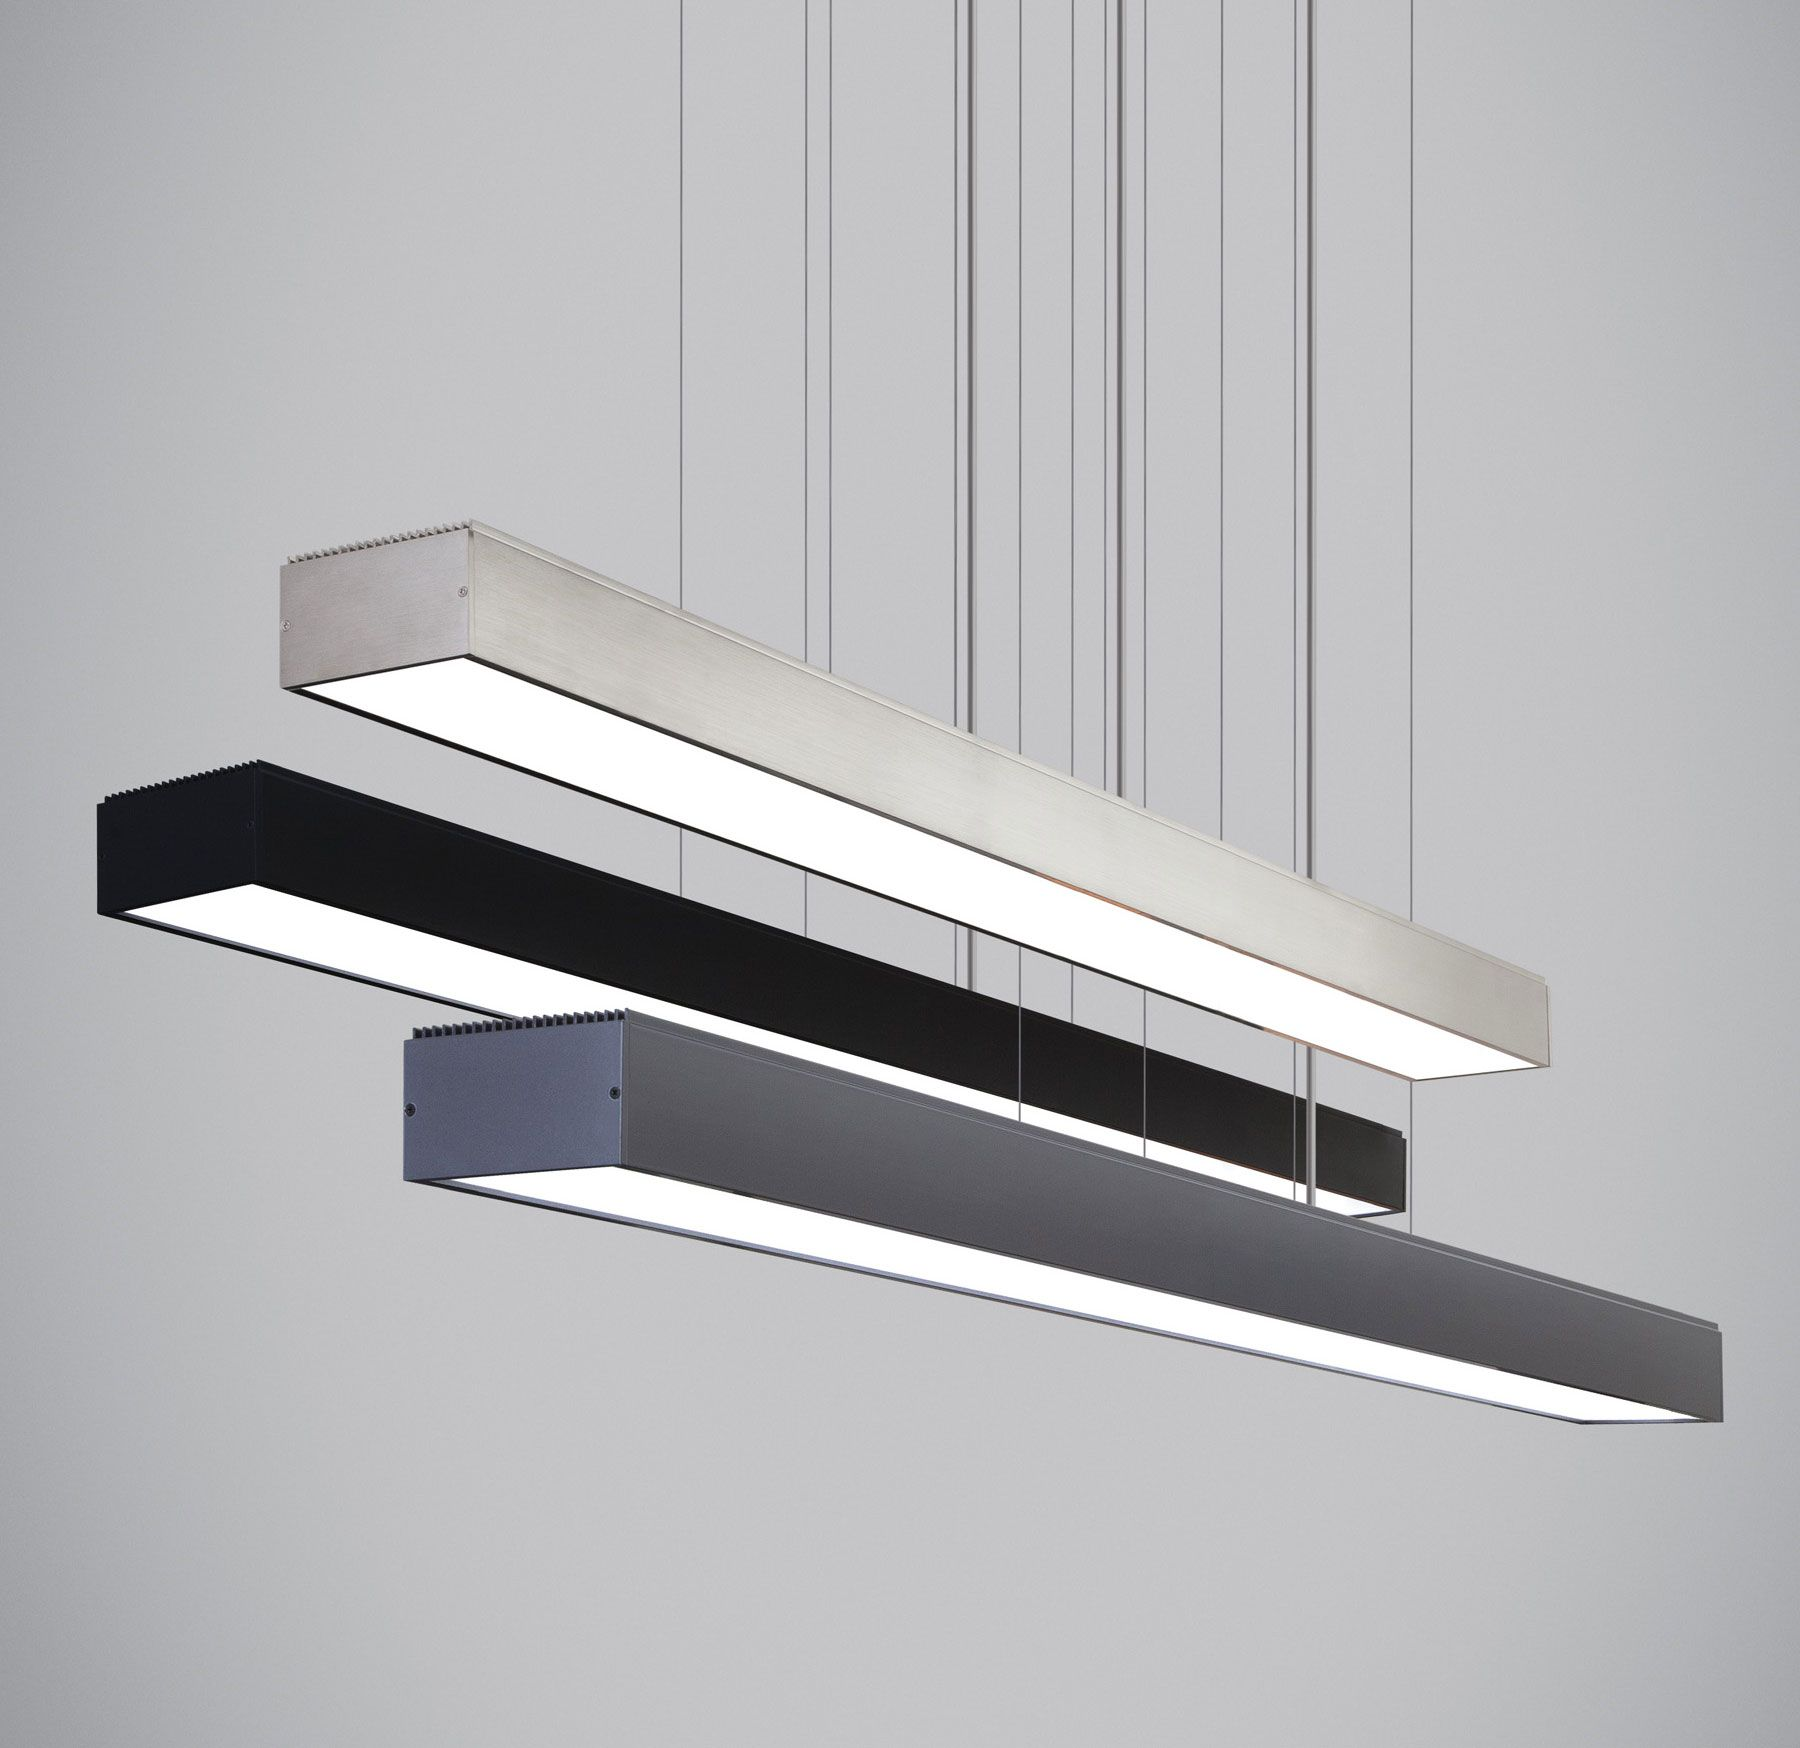 led kitchen light fixtures Ceiling lighting